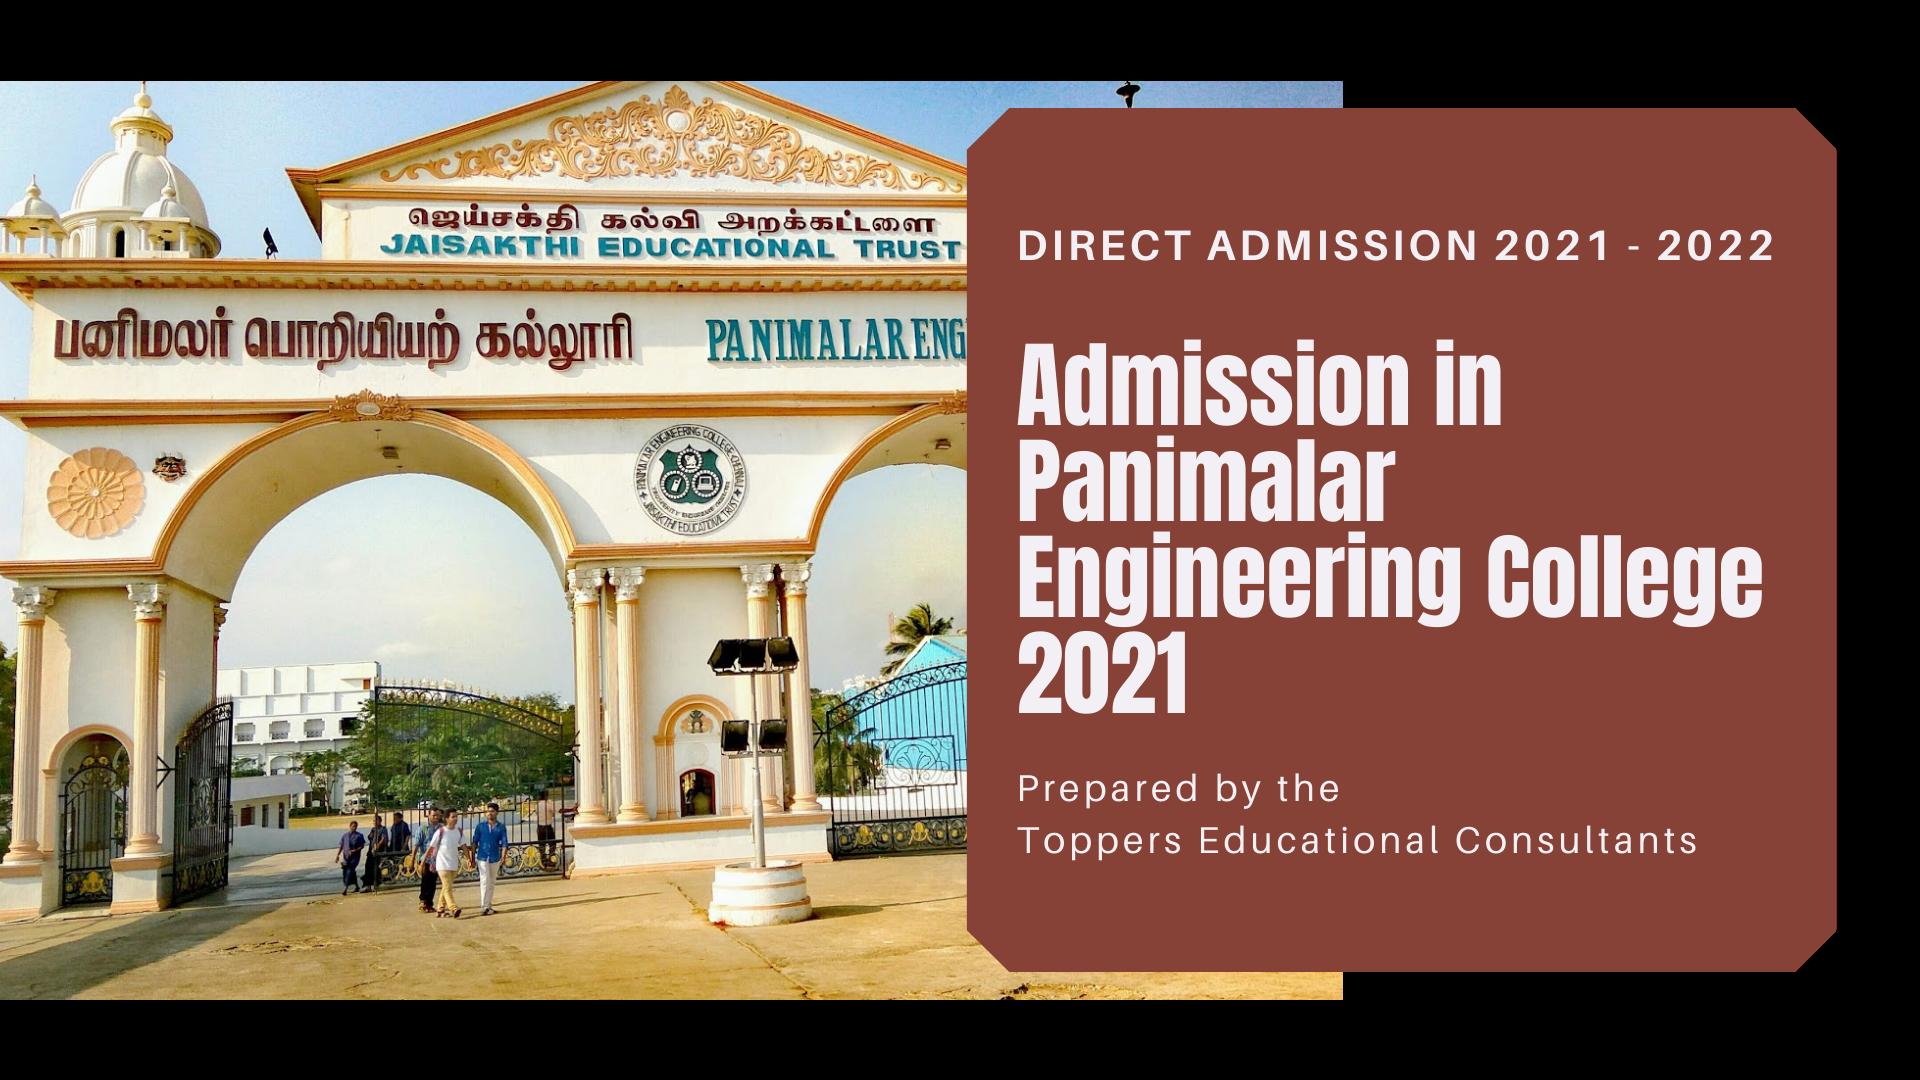 Admission in Panimalar Engineering College 2021